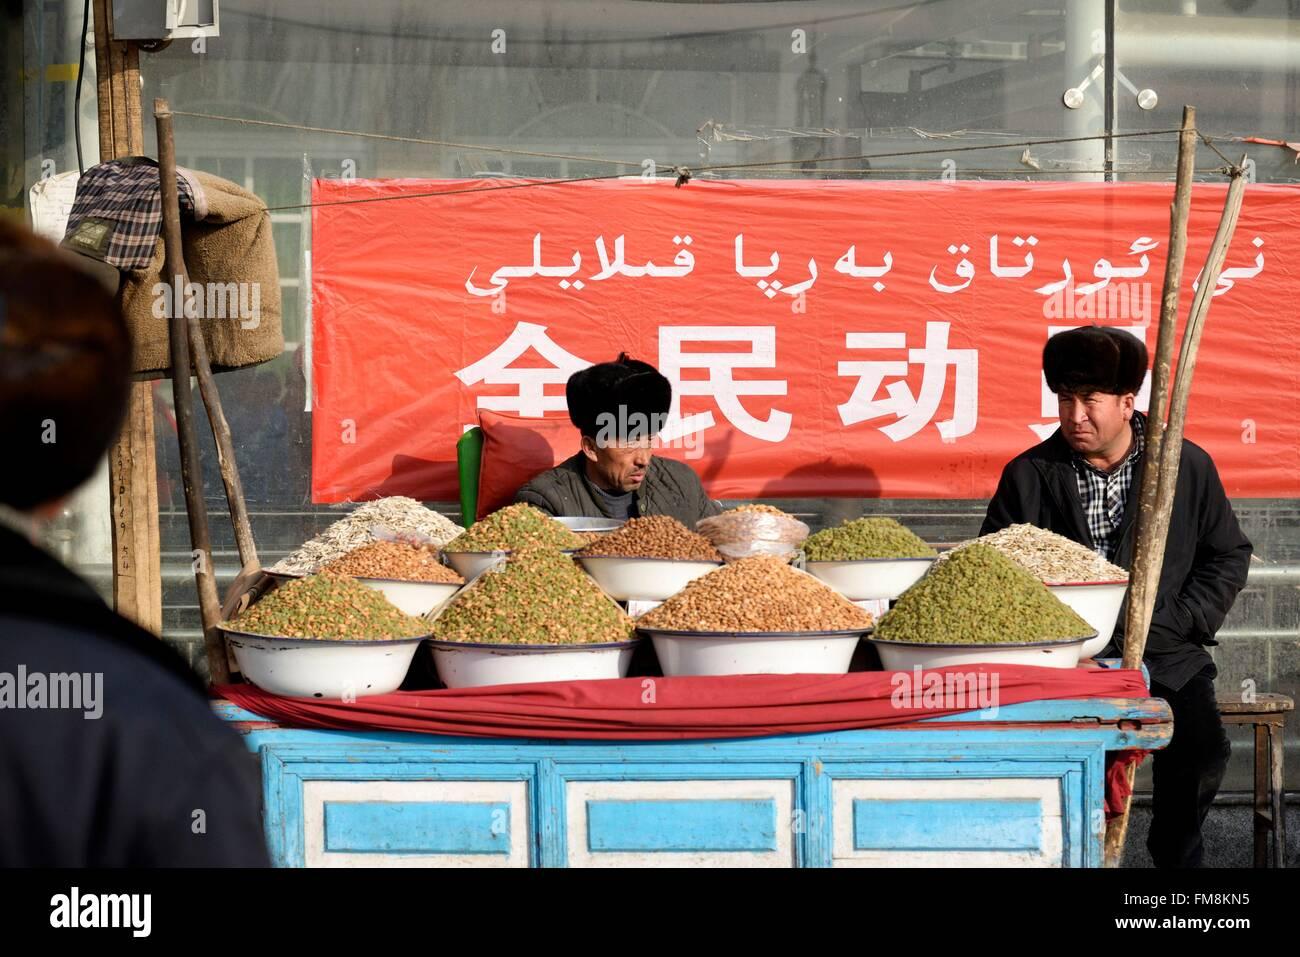 China, Xinjiang Uyghur Autonomous Region, Kashgar (Kashi